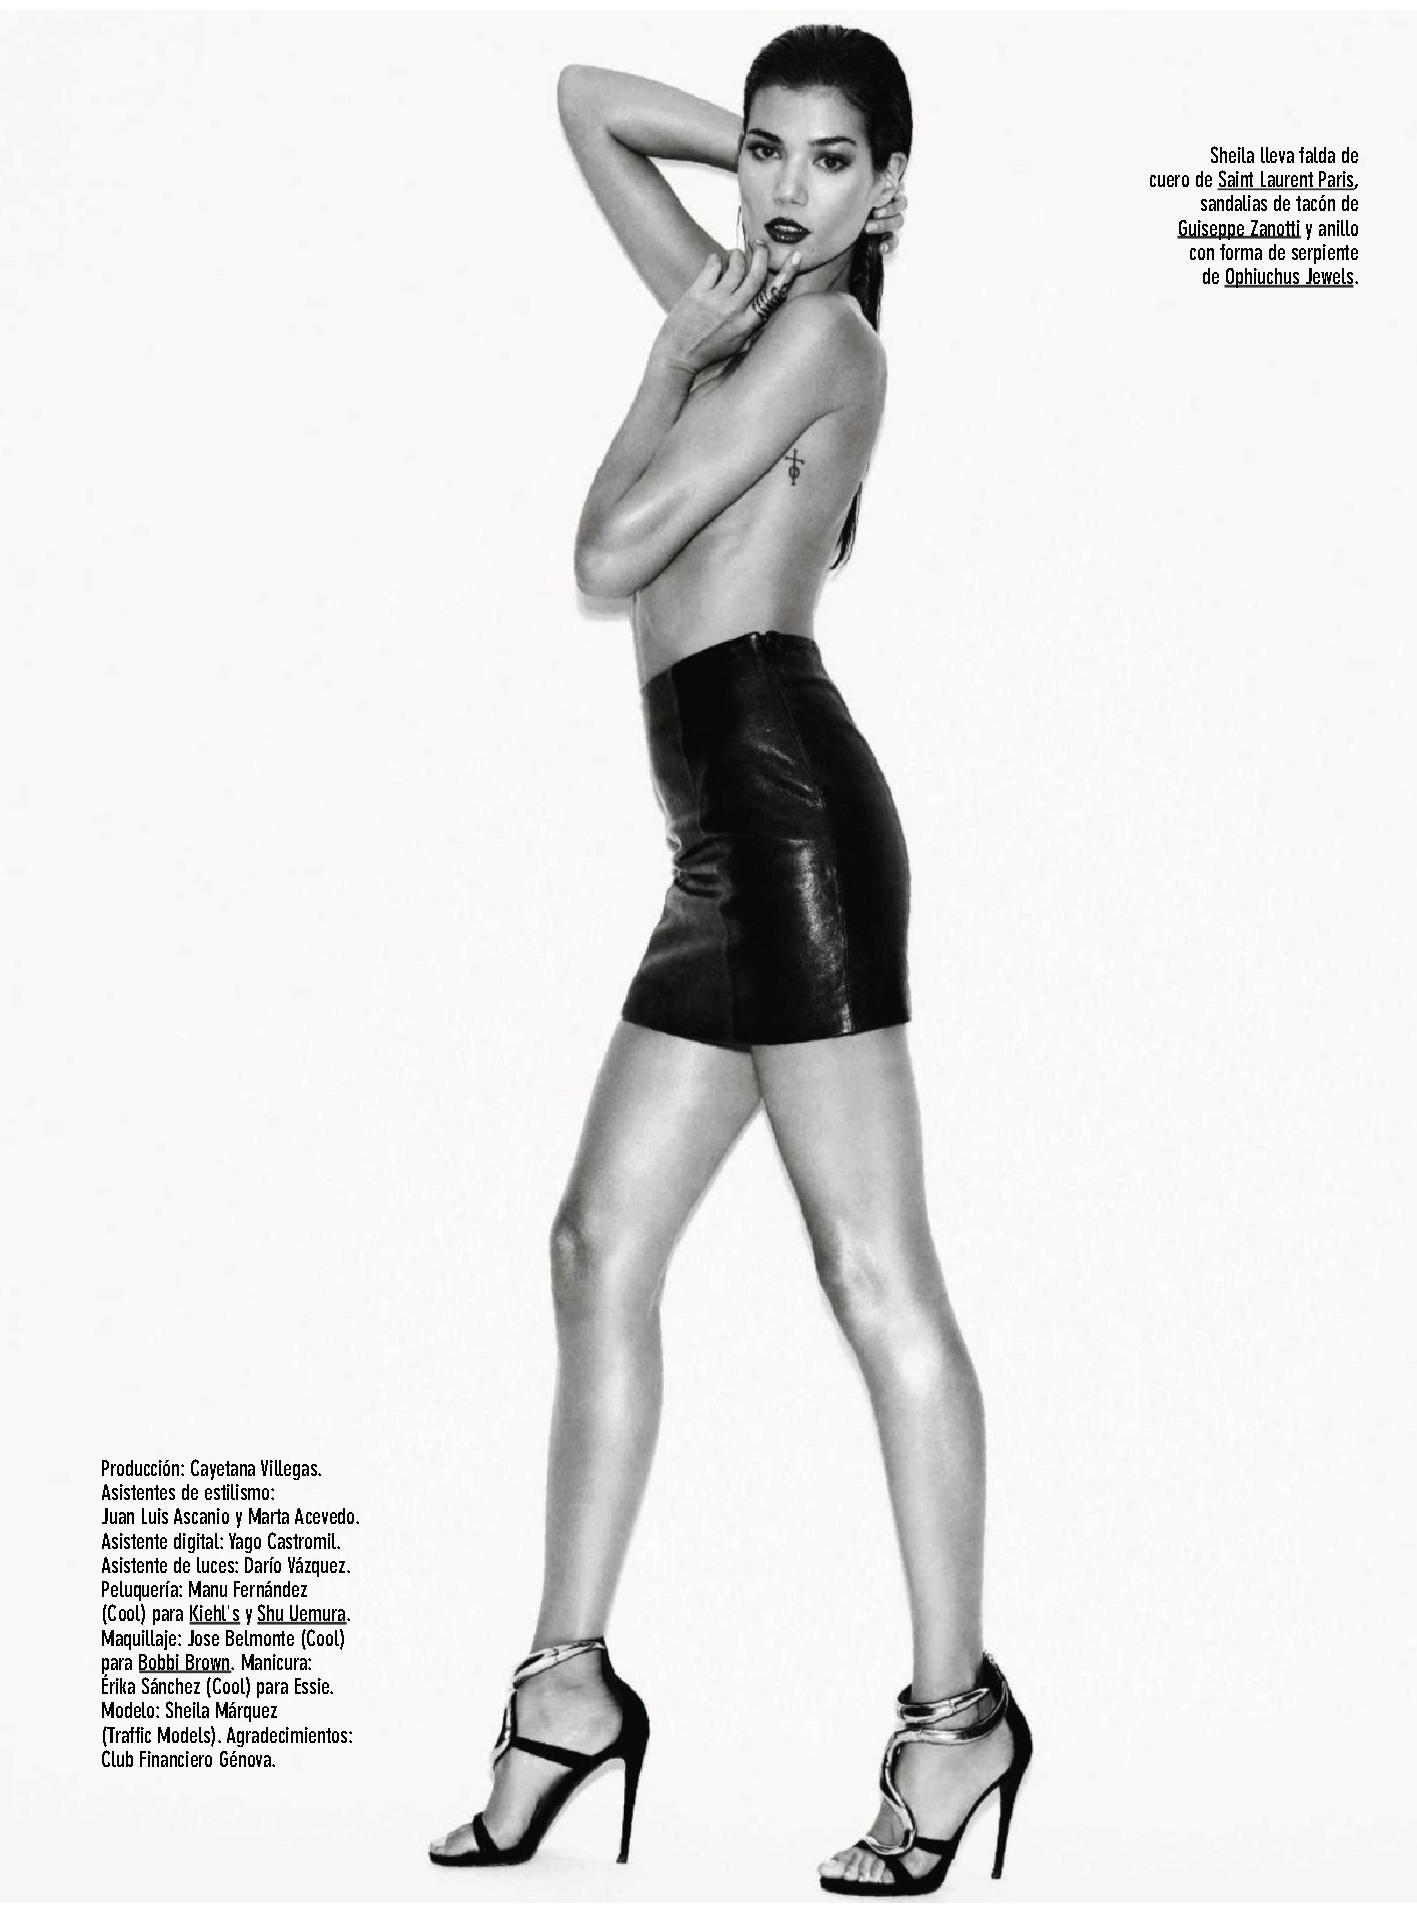 Feet Erika Marquez nudes (76 pics), Paparazzi